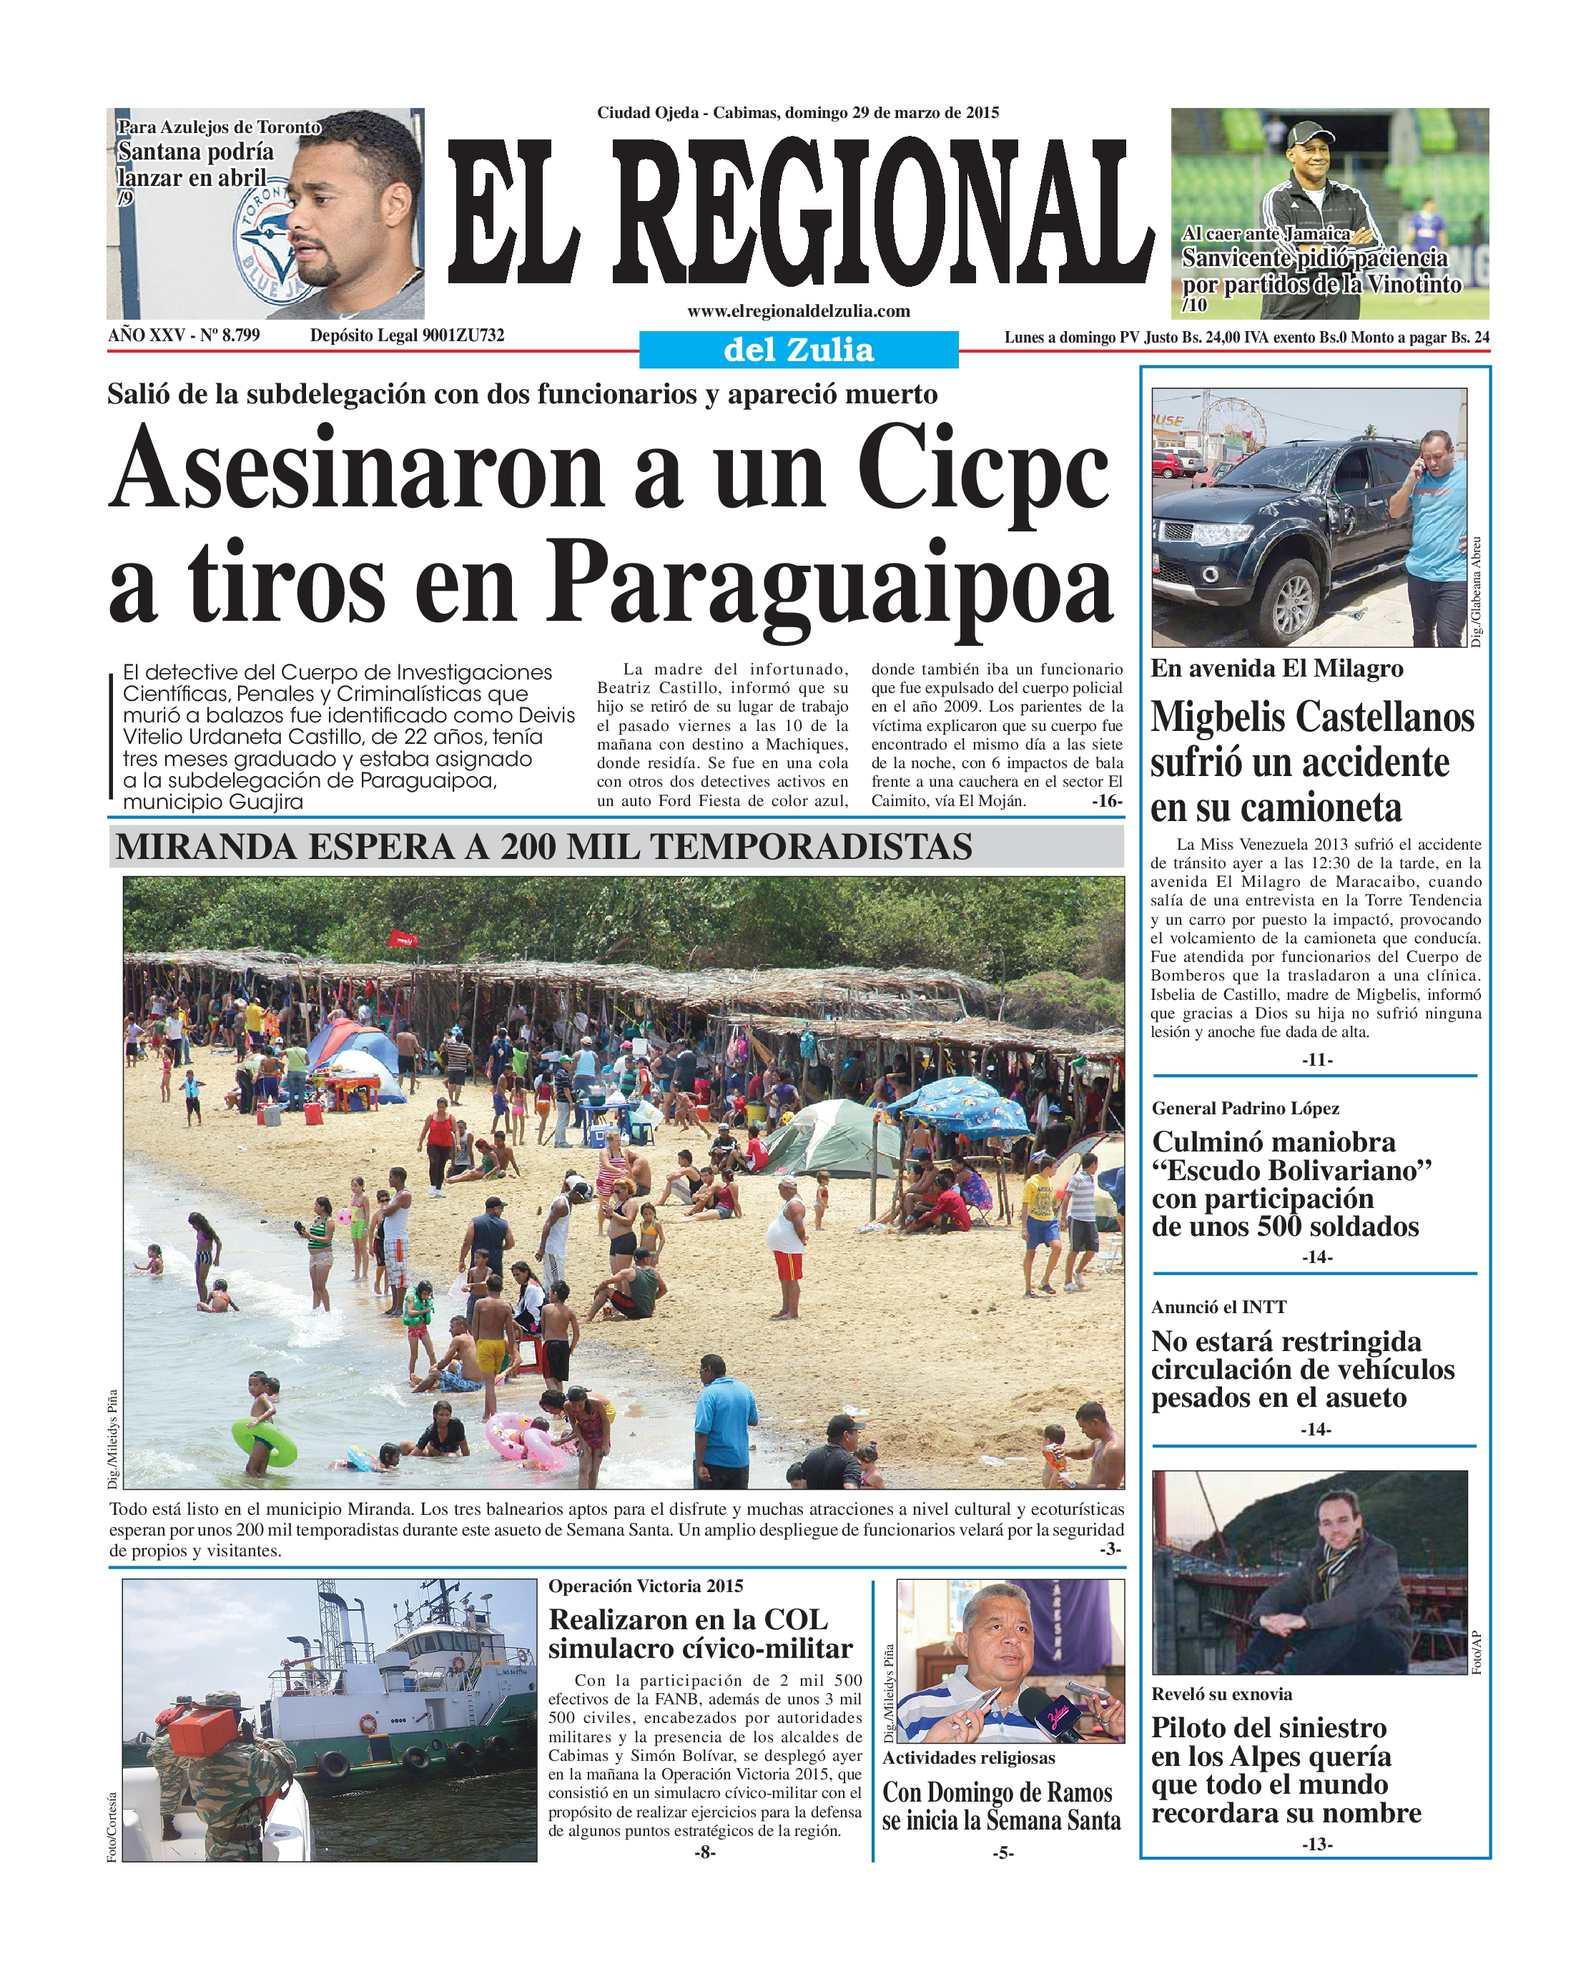 Calaméo - El Regional del Zulia 29-03-2015